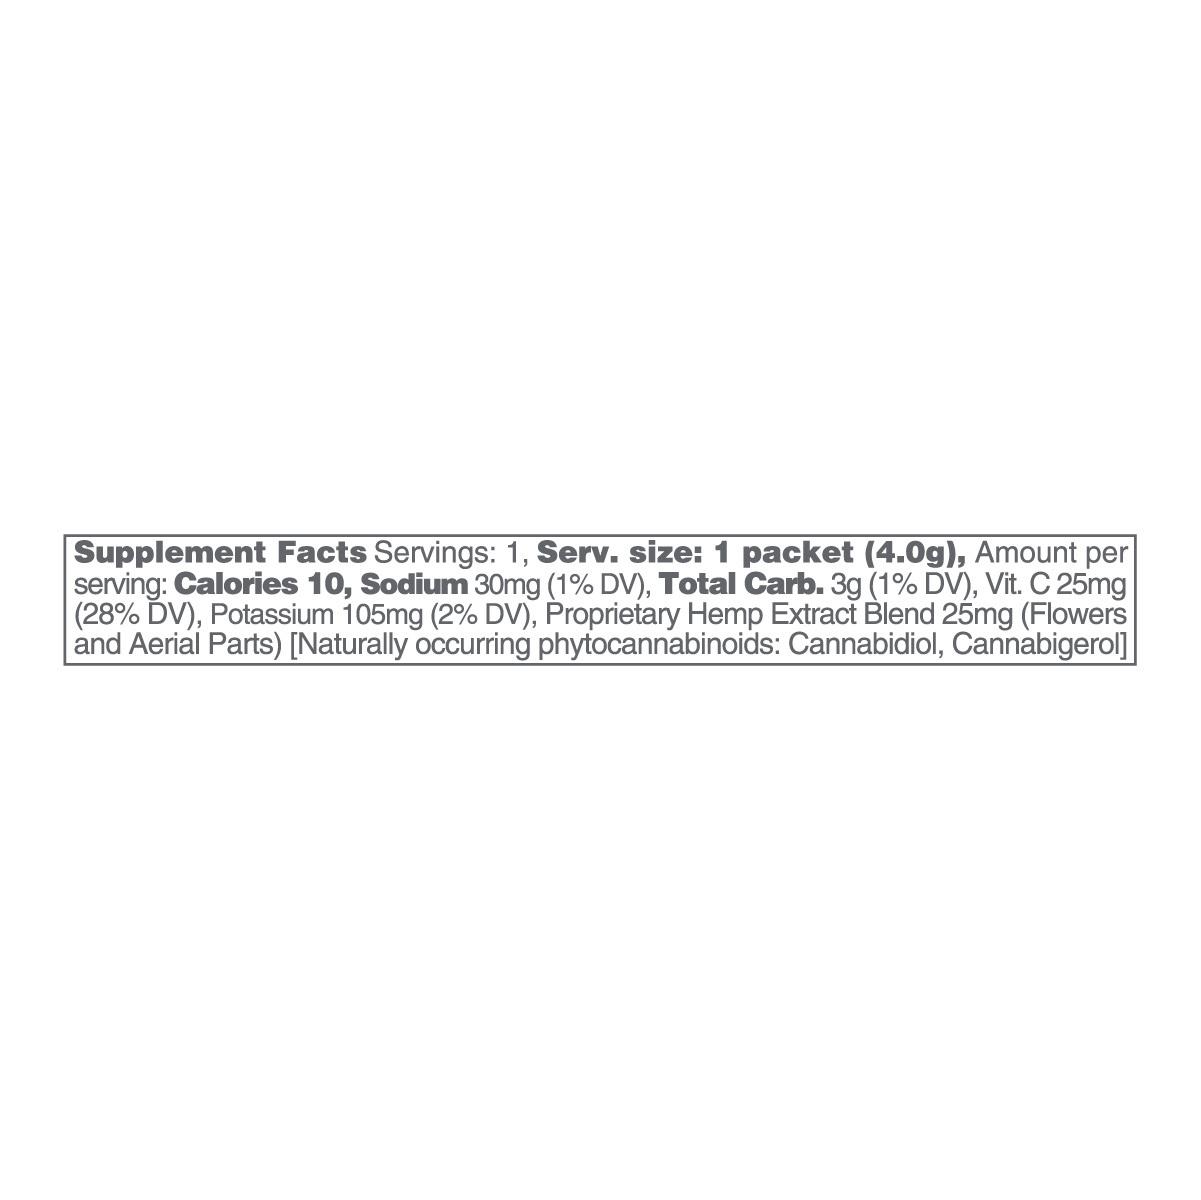 cbdMD, CBD Powdered Drink Mix, Broad Spectrum THC-Free, Lemonade, 10ct, 250mg CBD 2